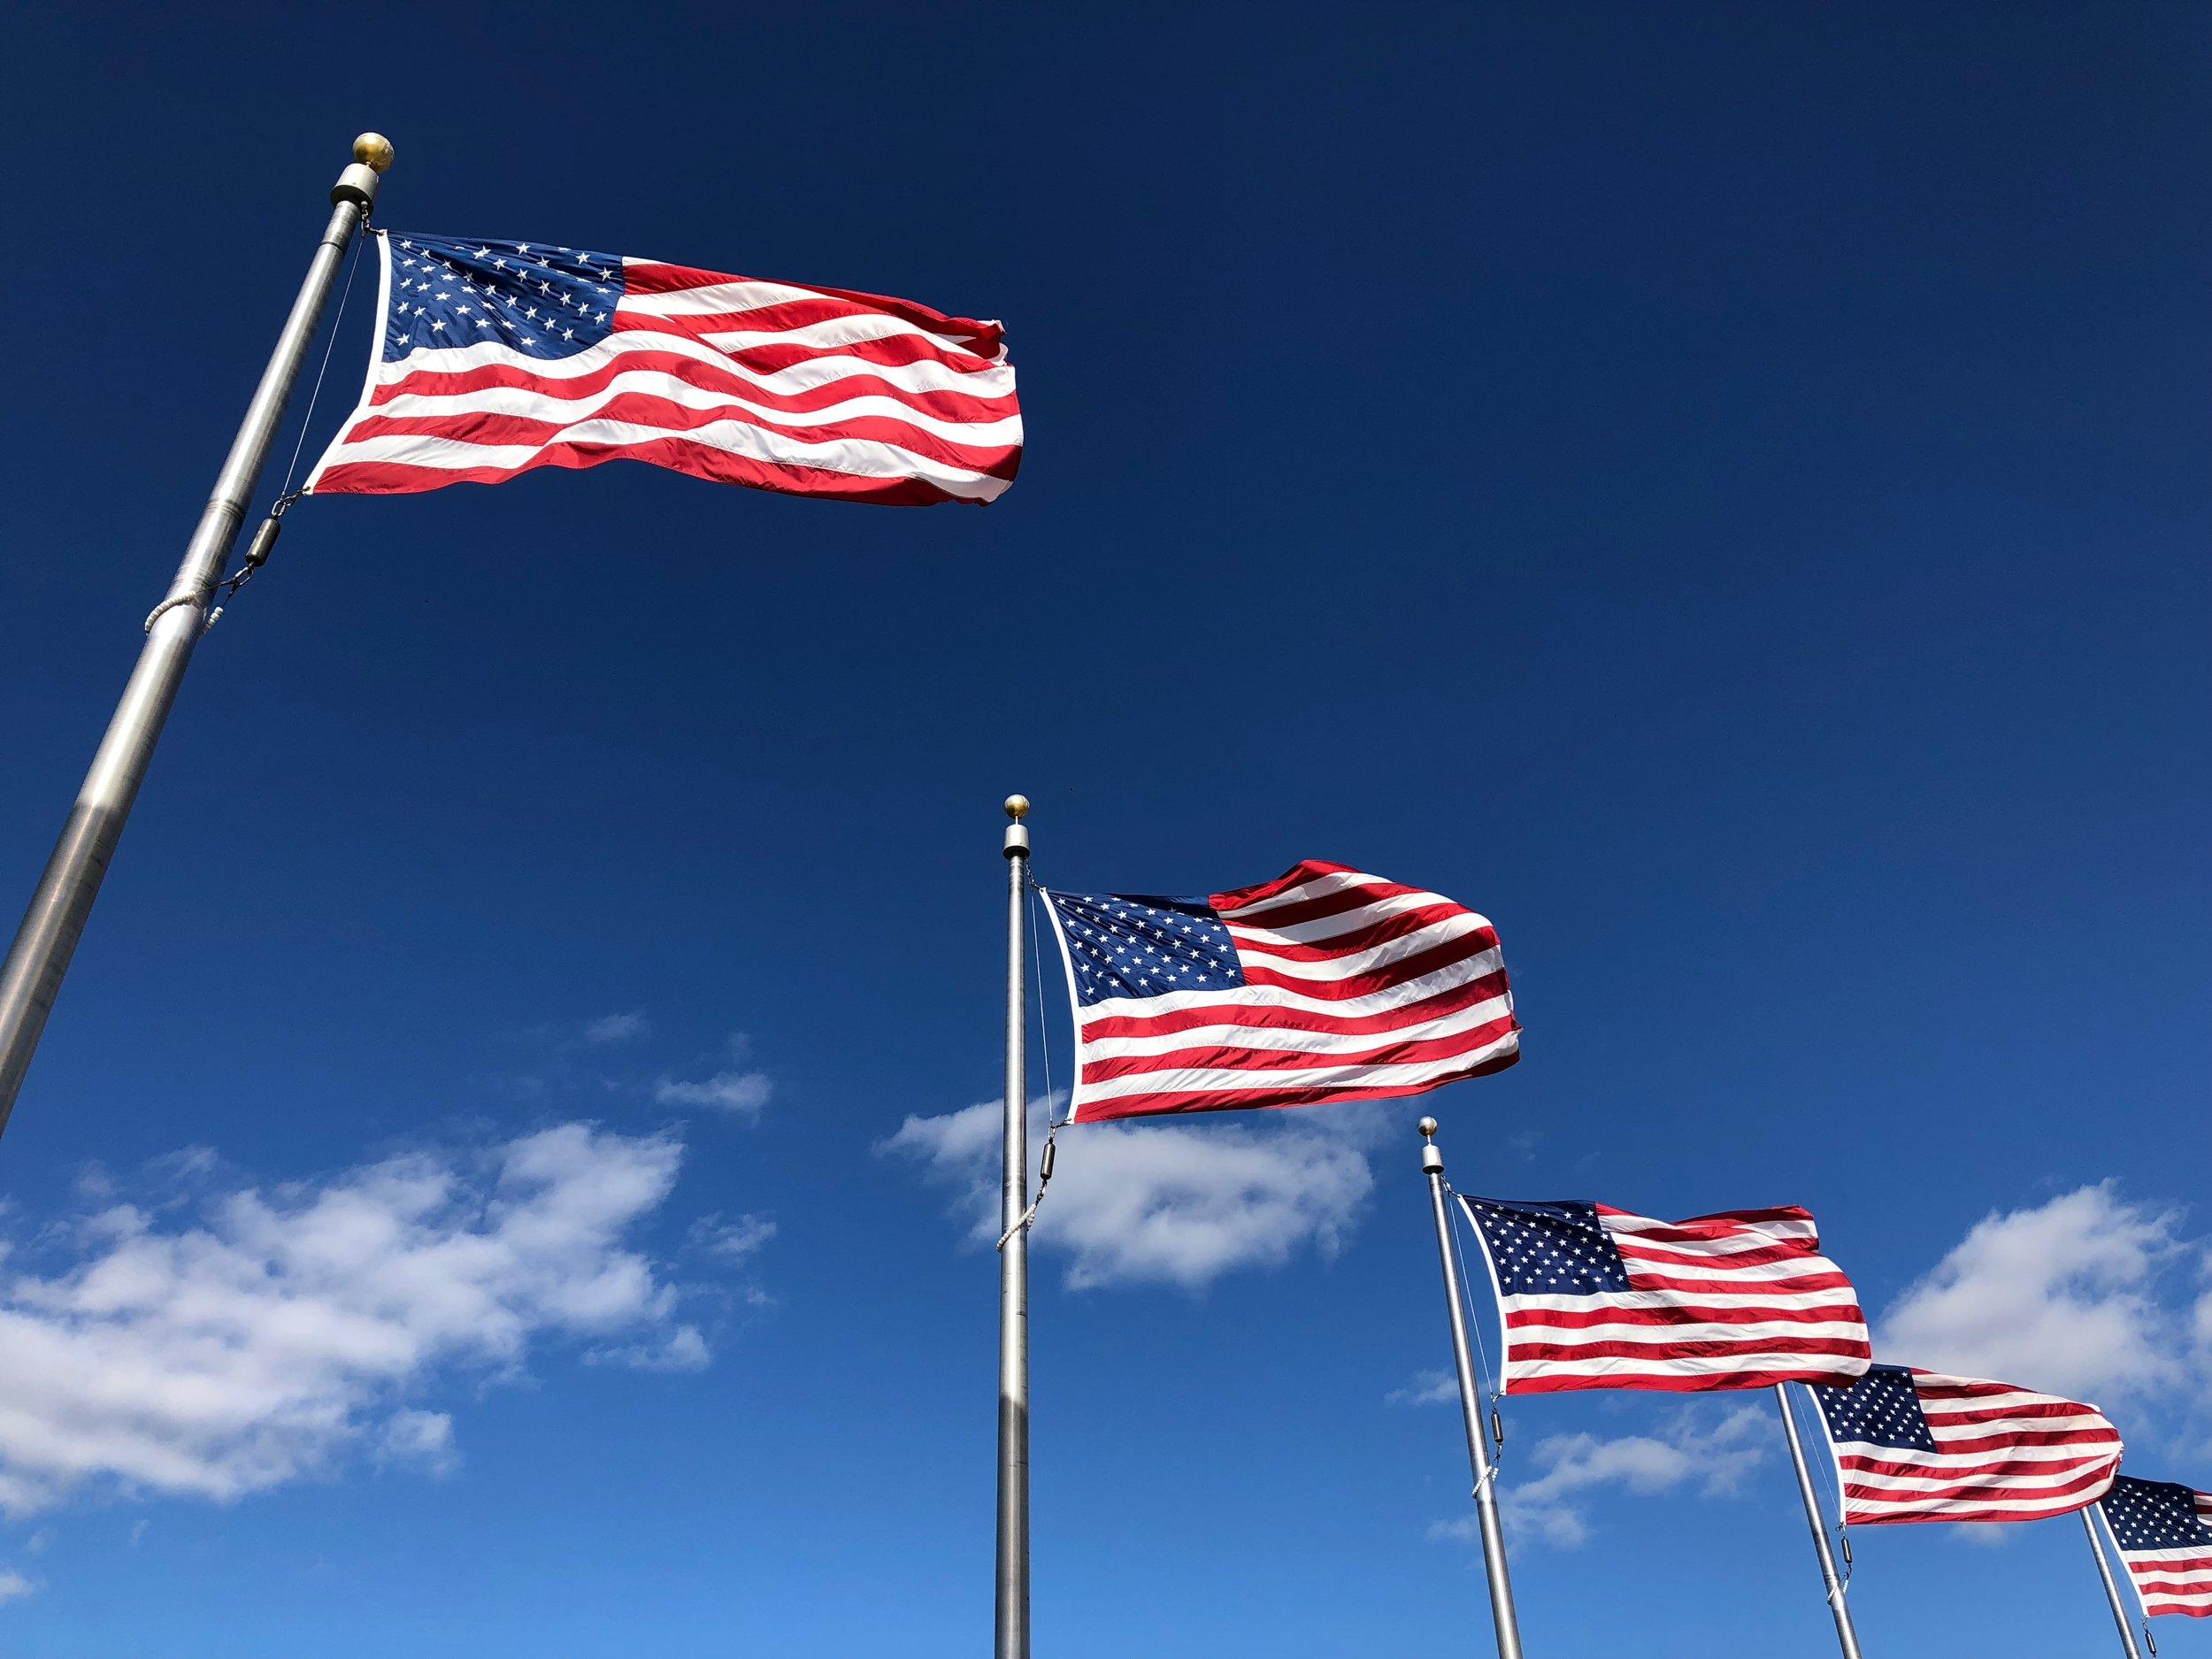 VA - For veterans & current service membersSEE MORE →